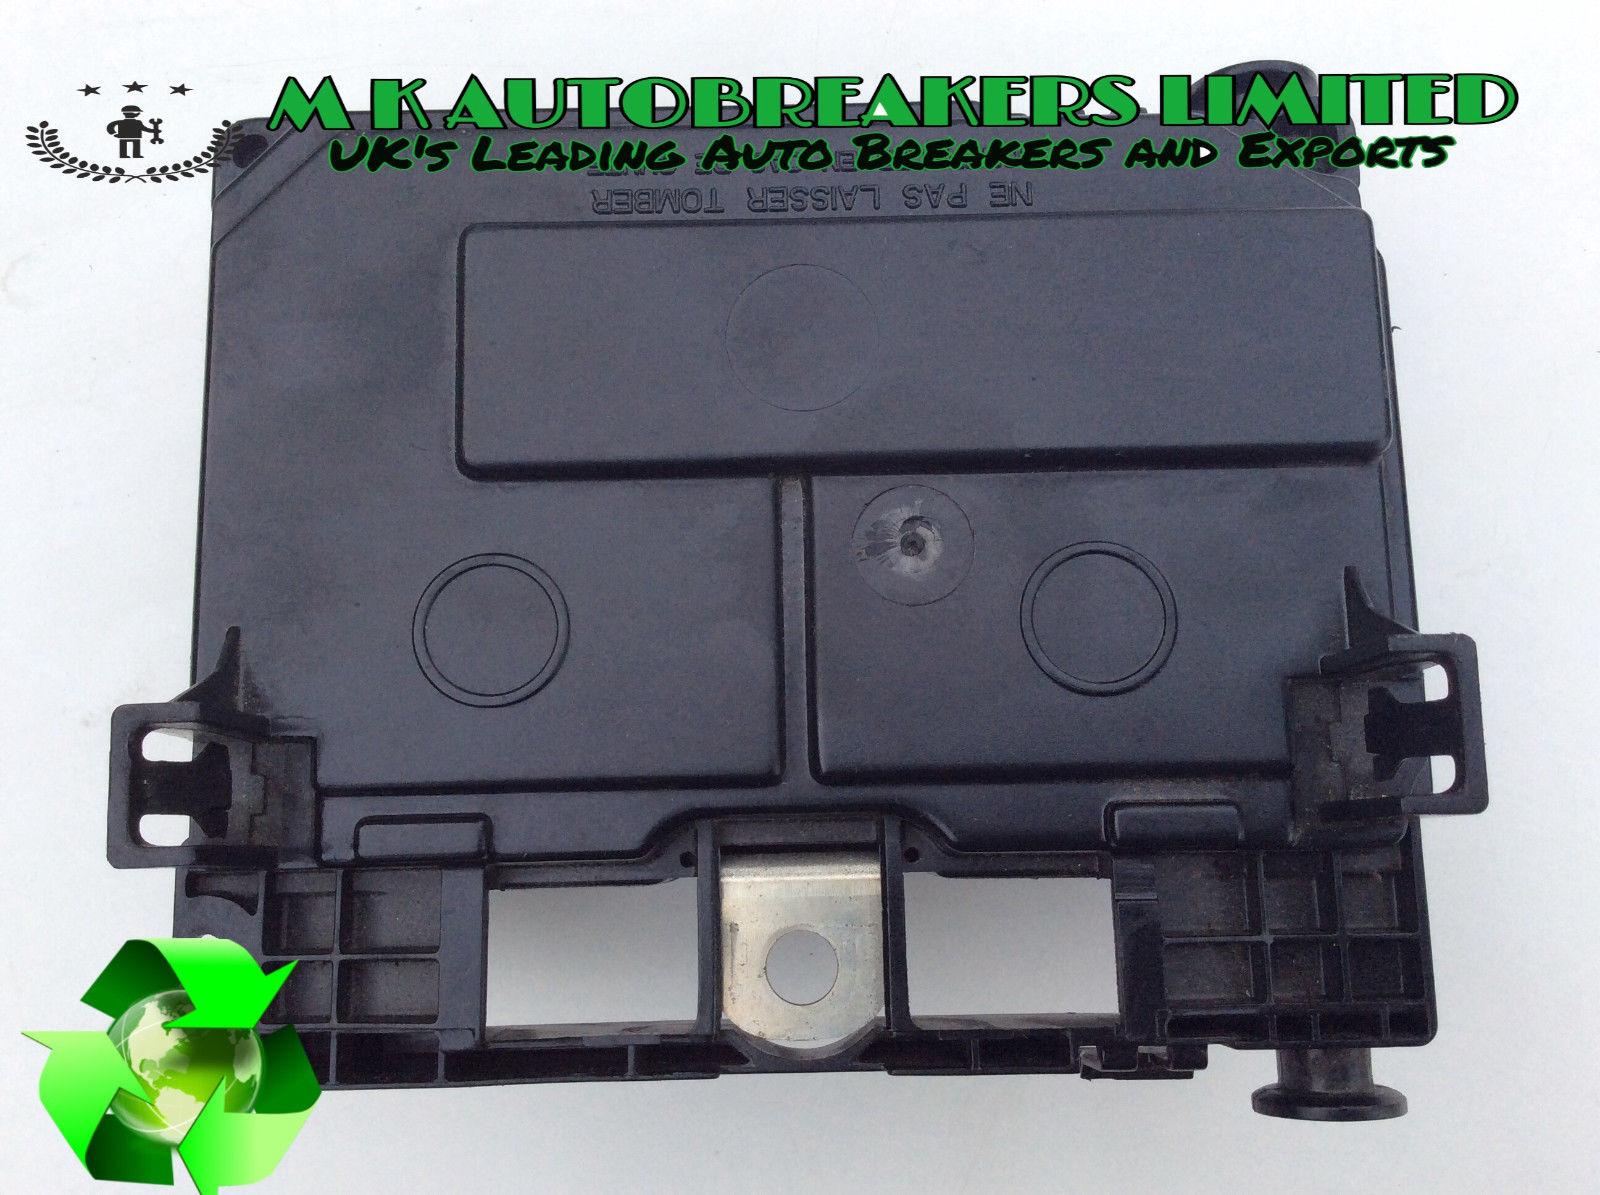 mk autobreakers ltd